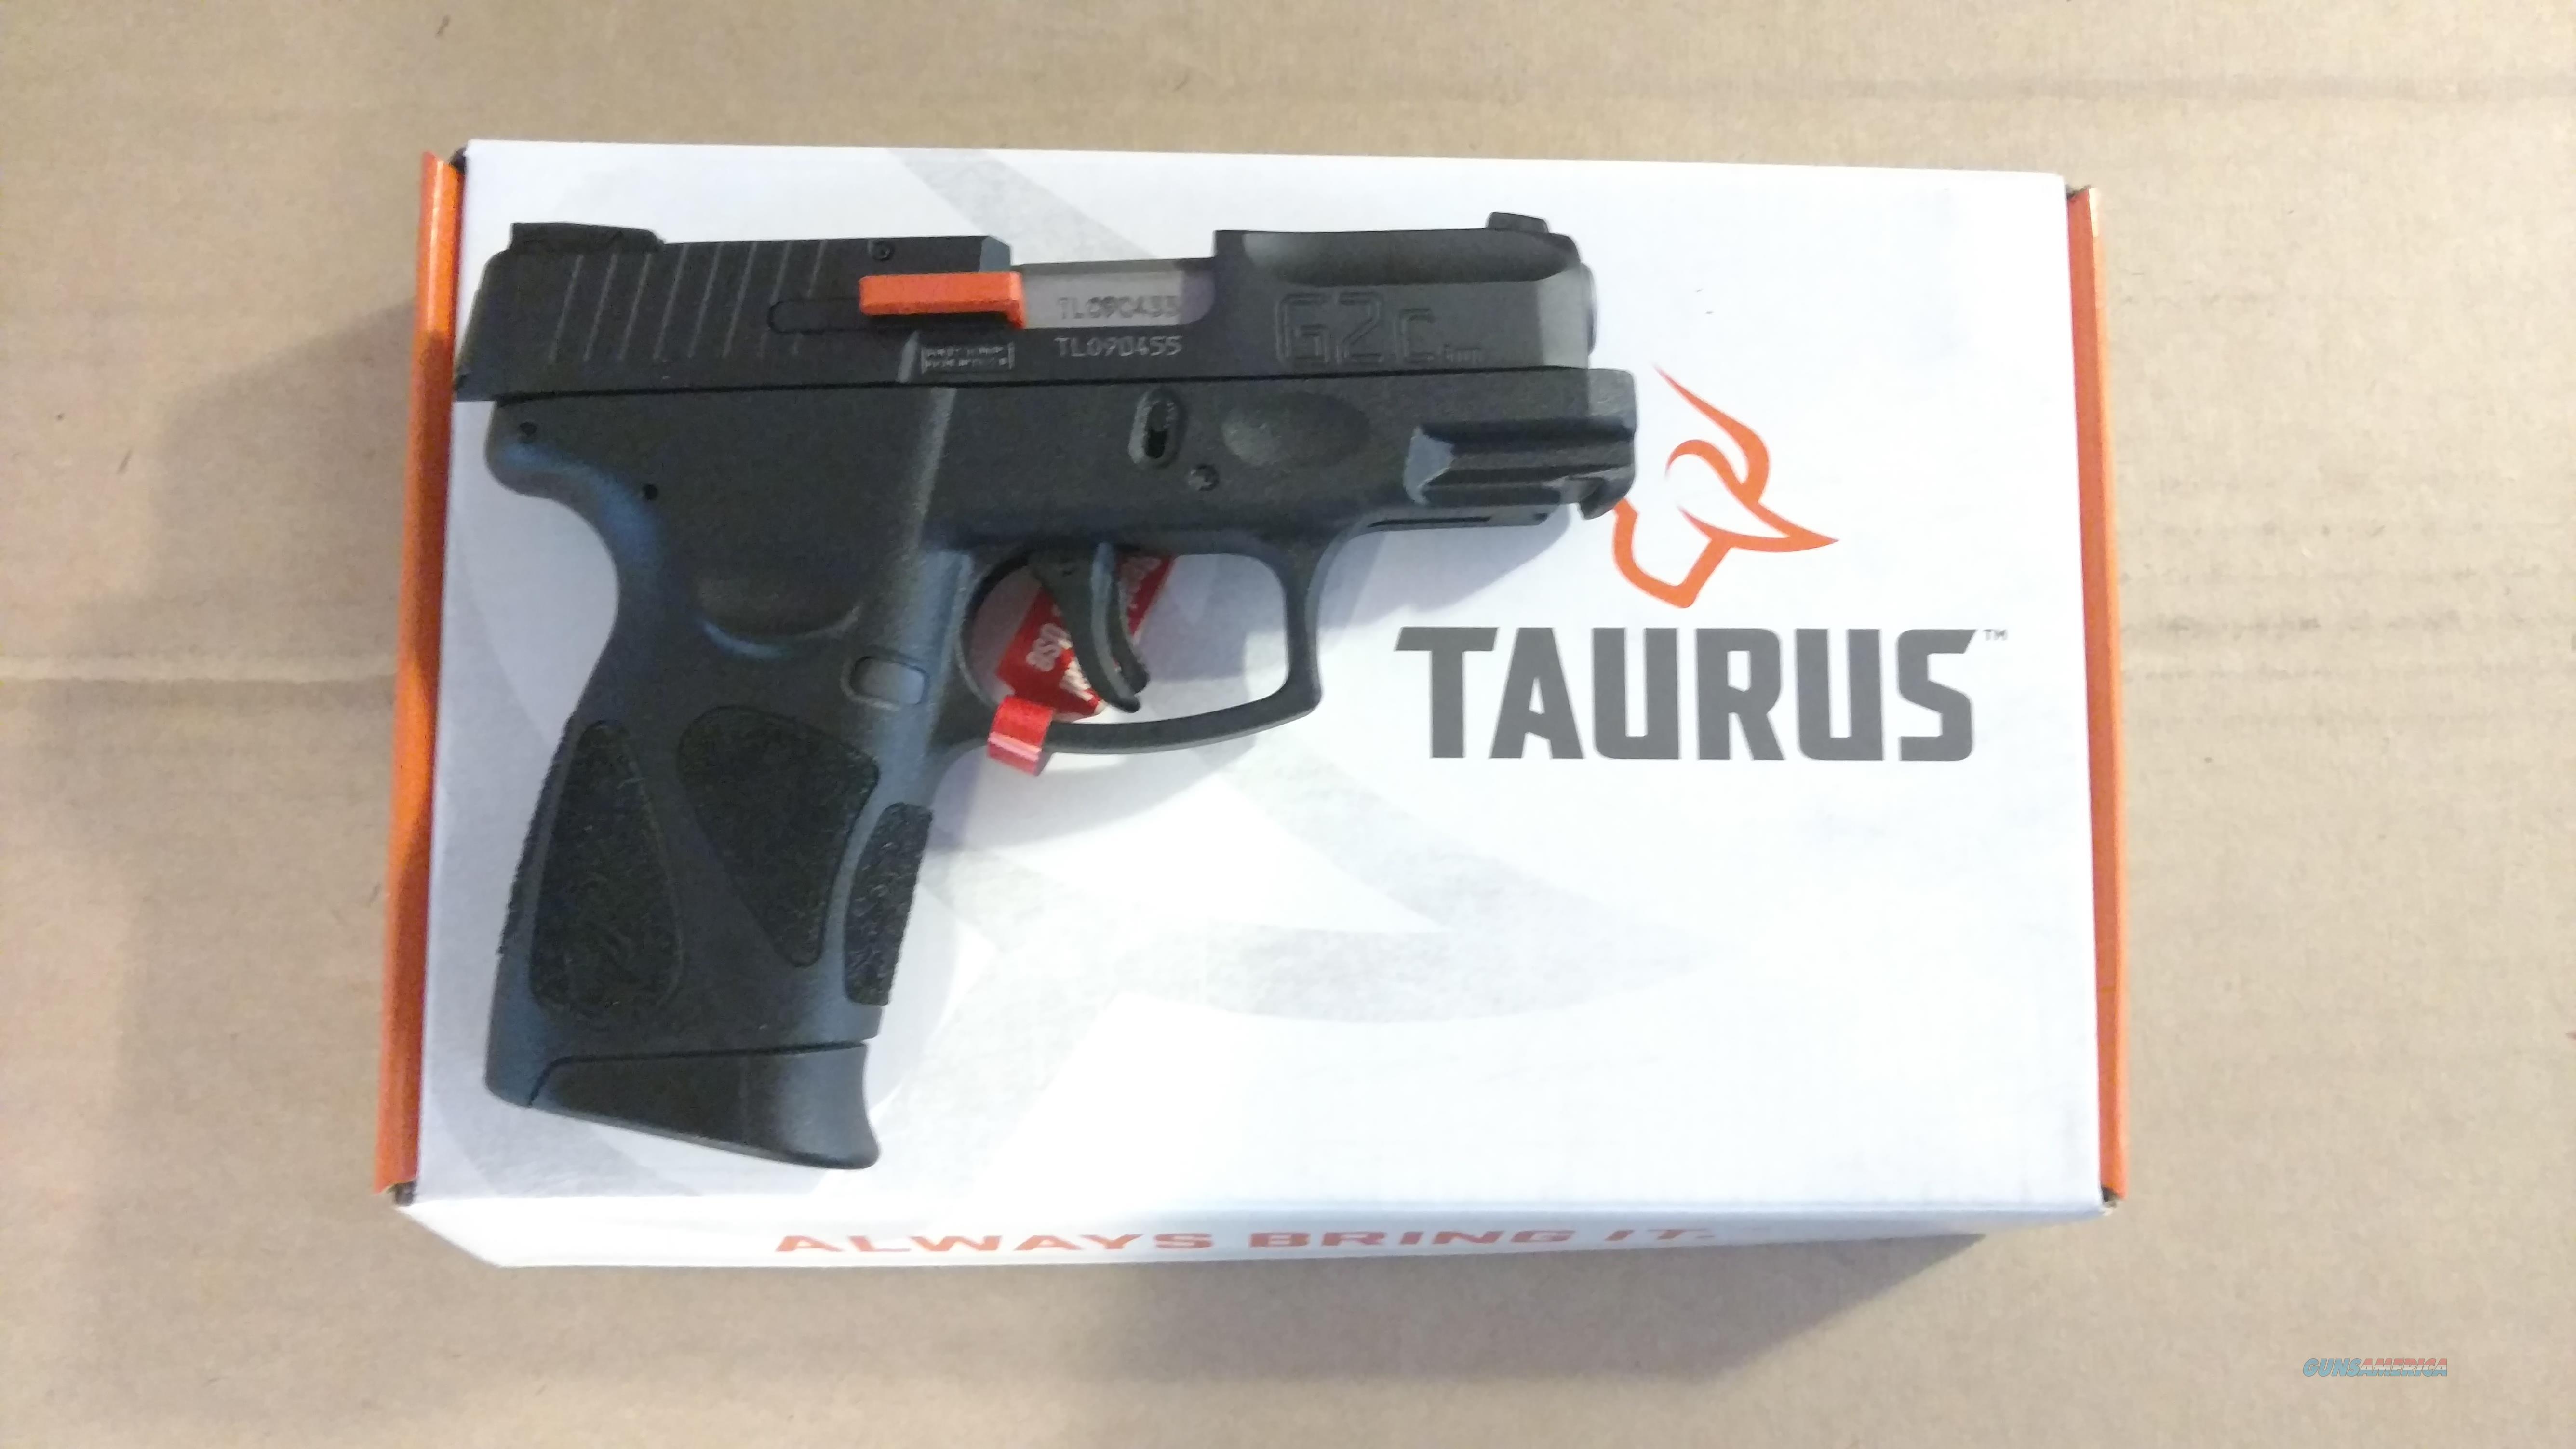 Taurus G2c 9mm 11rd.  Guns > Pistols > Taurus Pistols > Semi Auto Pistols > Polymer Frame